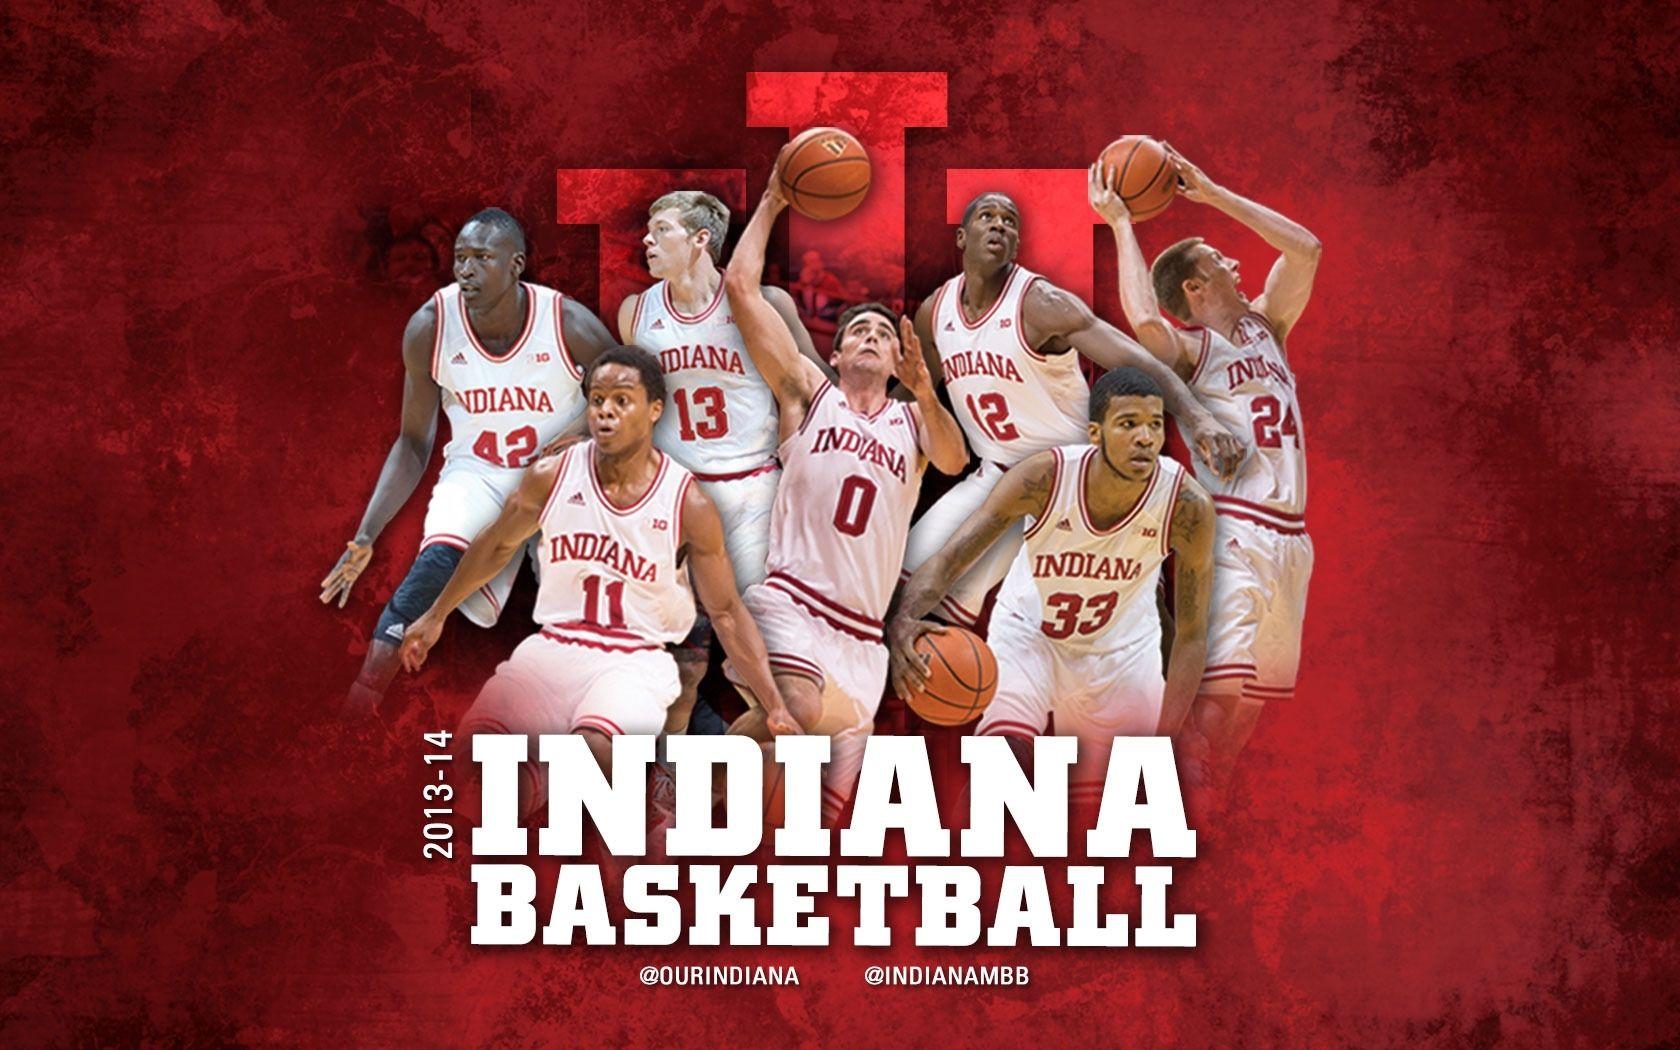 Indiana hoosiers basketball iphone wallpaper download - Iu basketball wallpaper ...